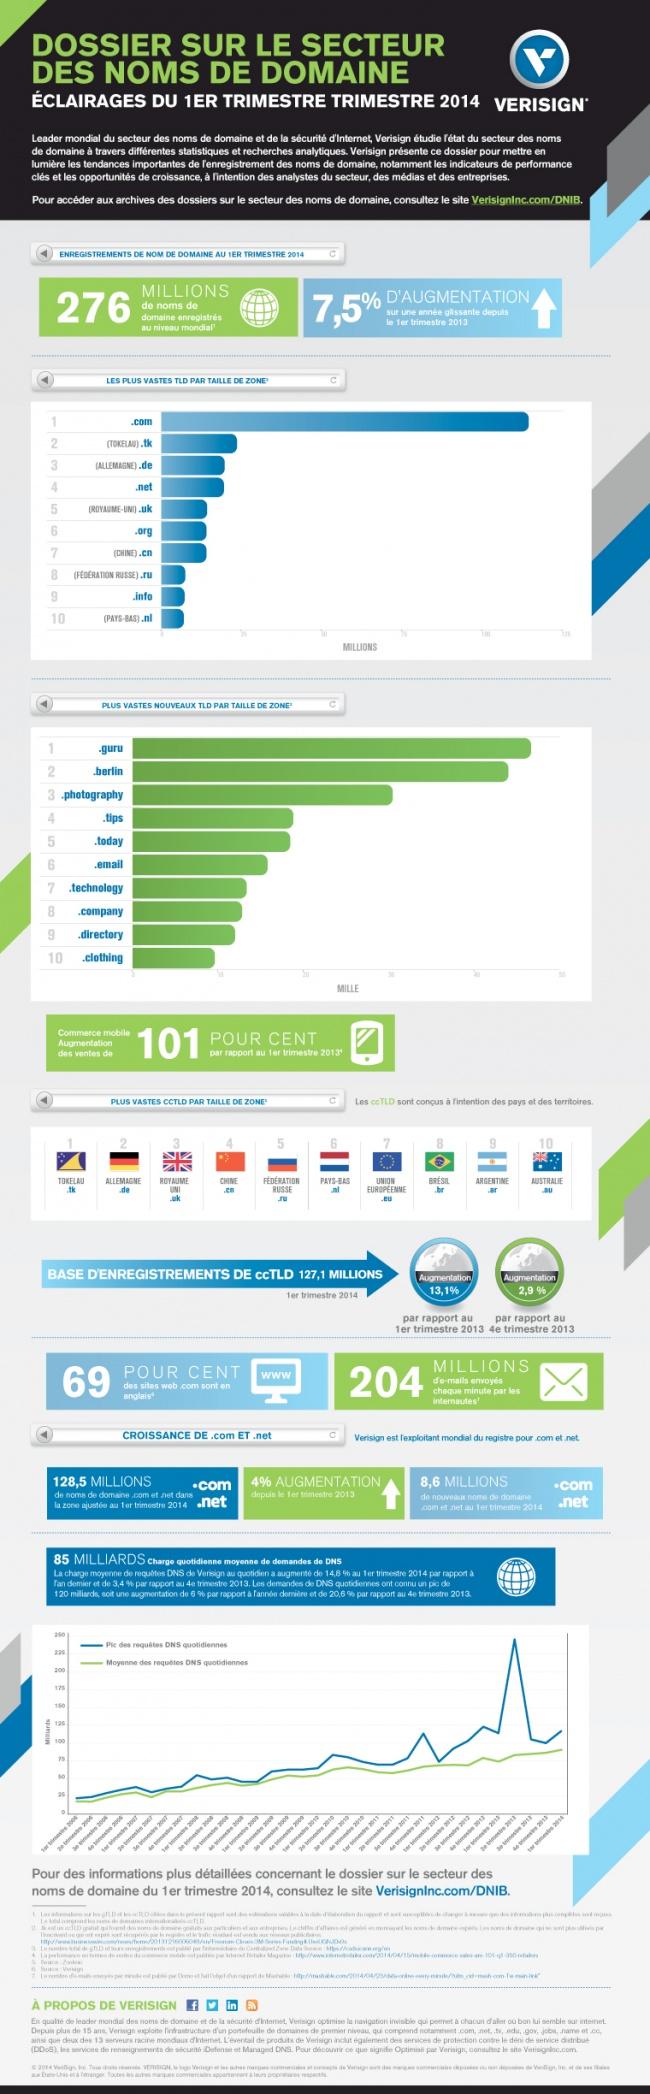 Infographie_Verisign_01-09-2014